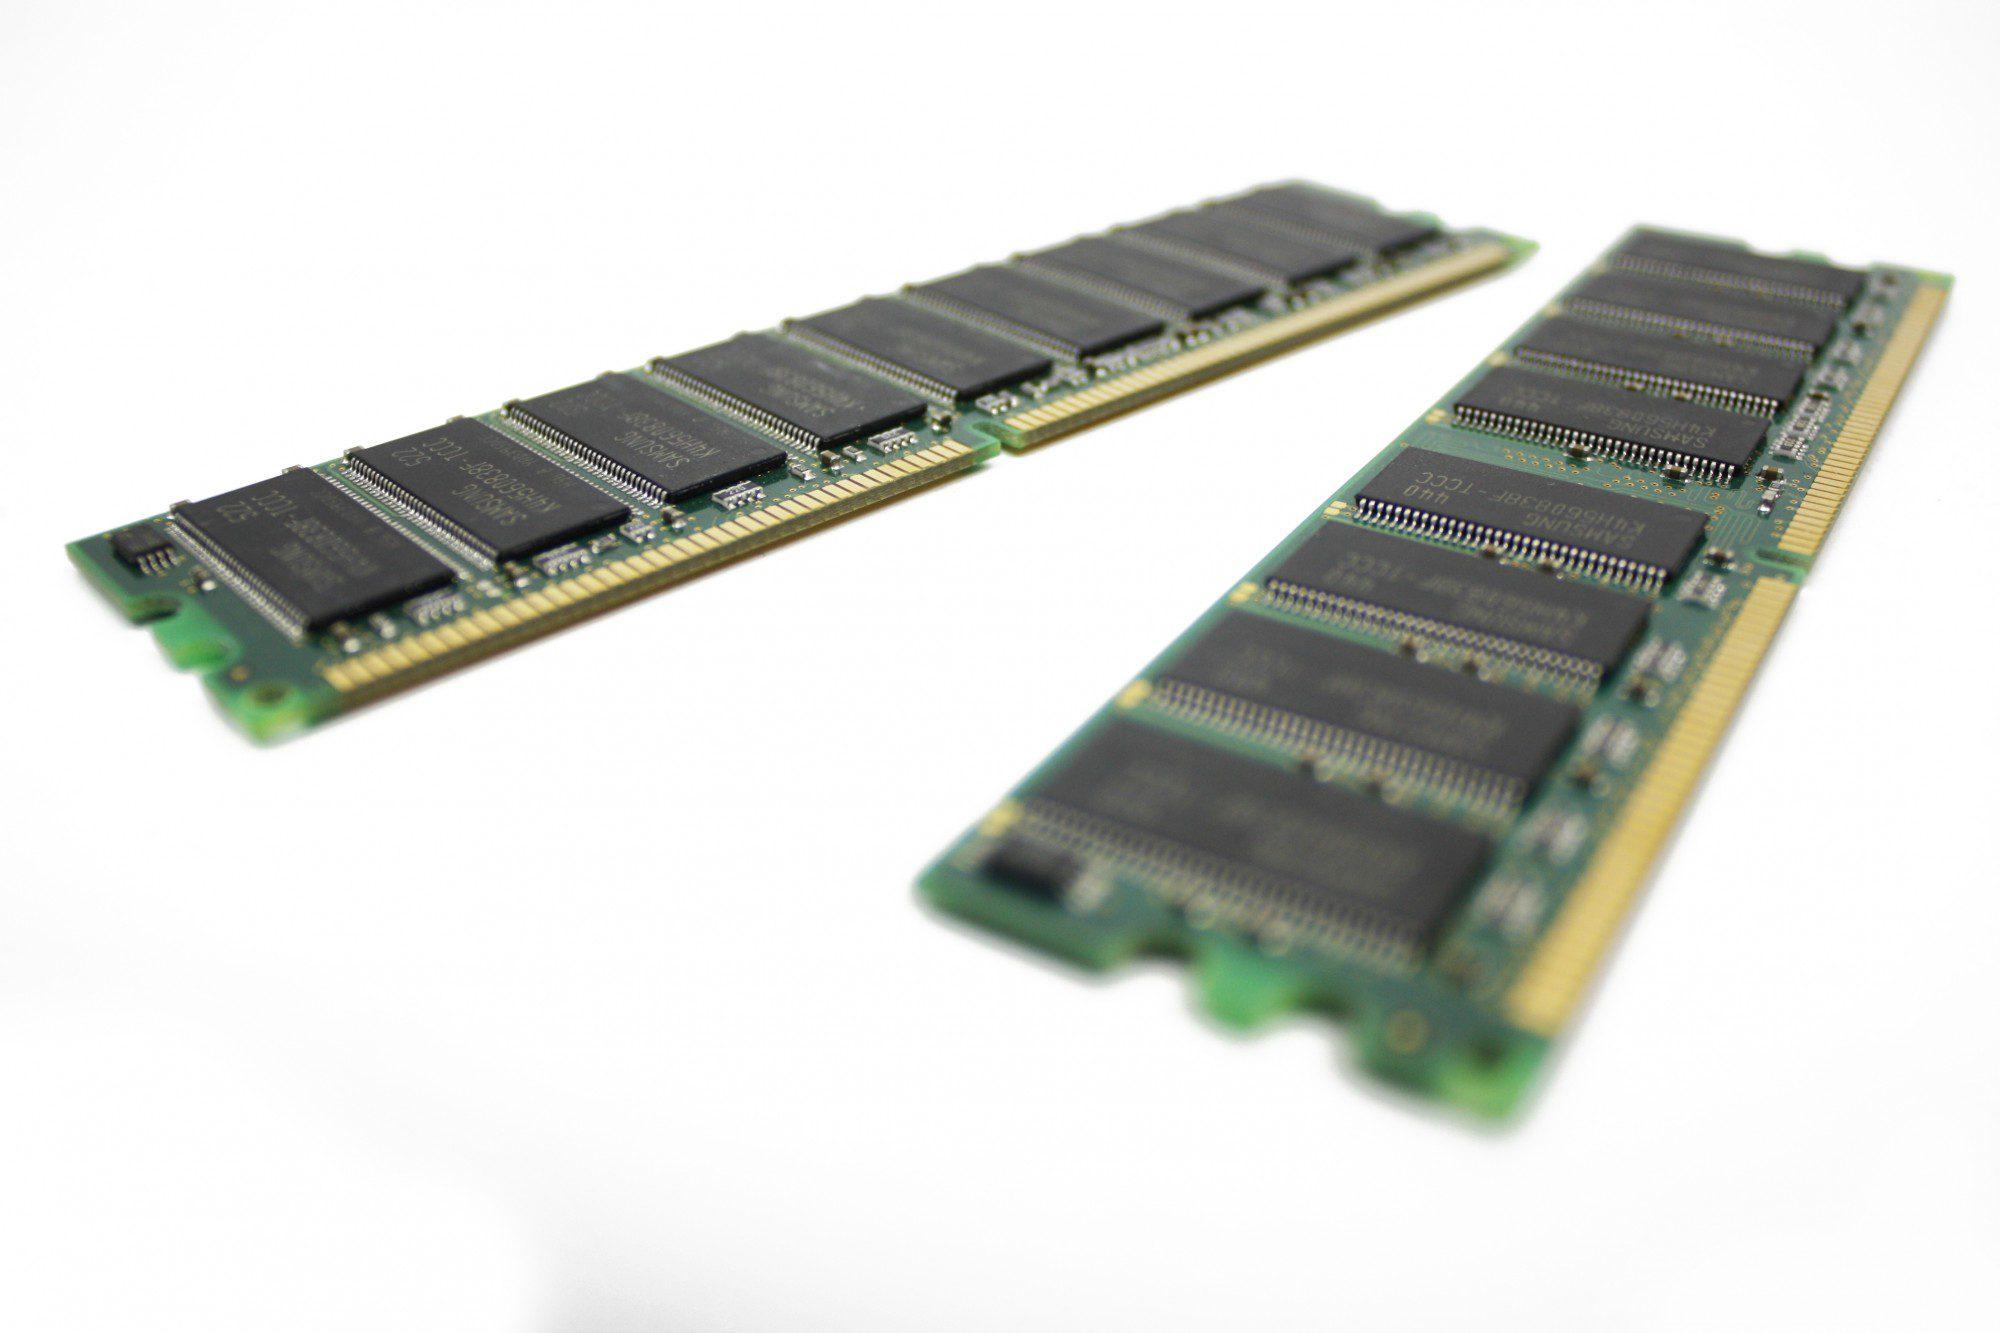 Two RAM Stick DDR